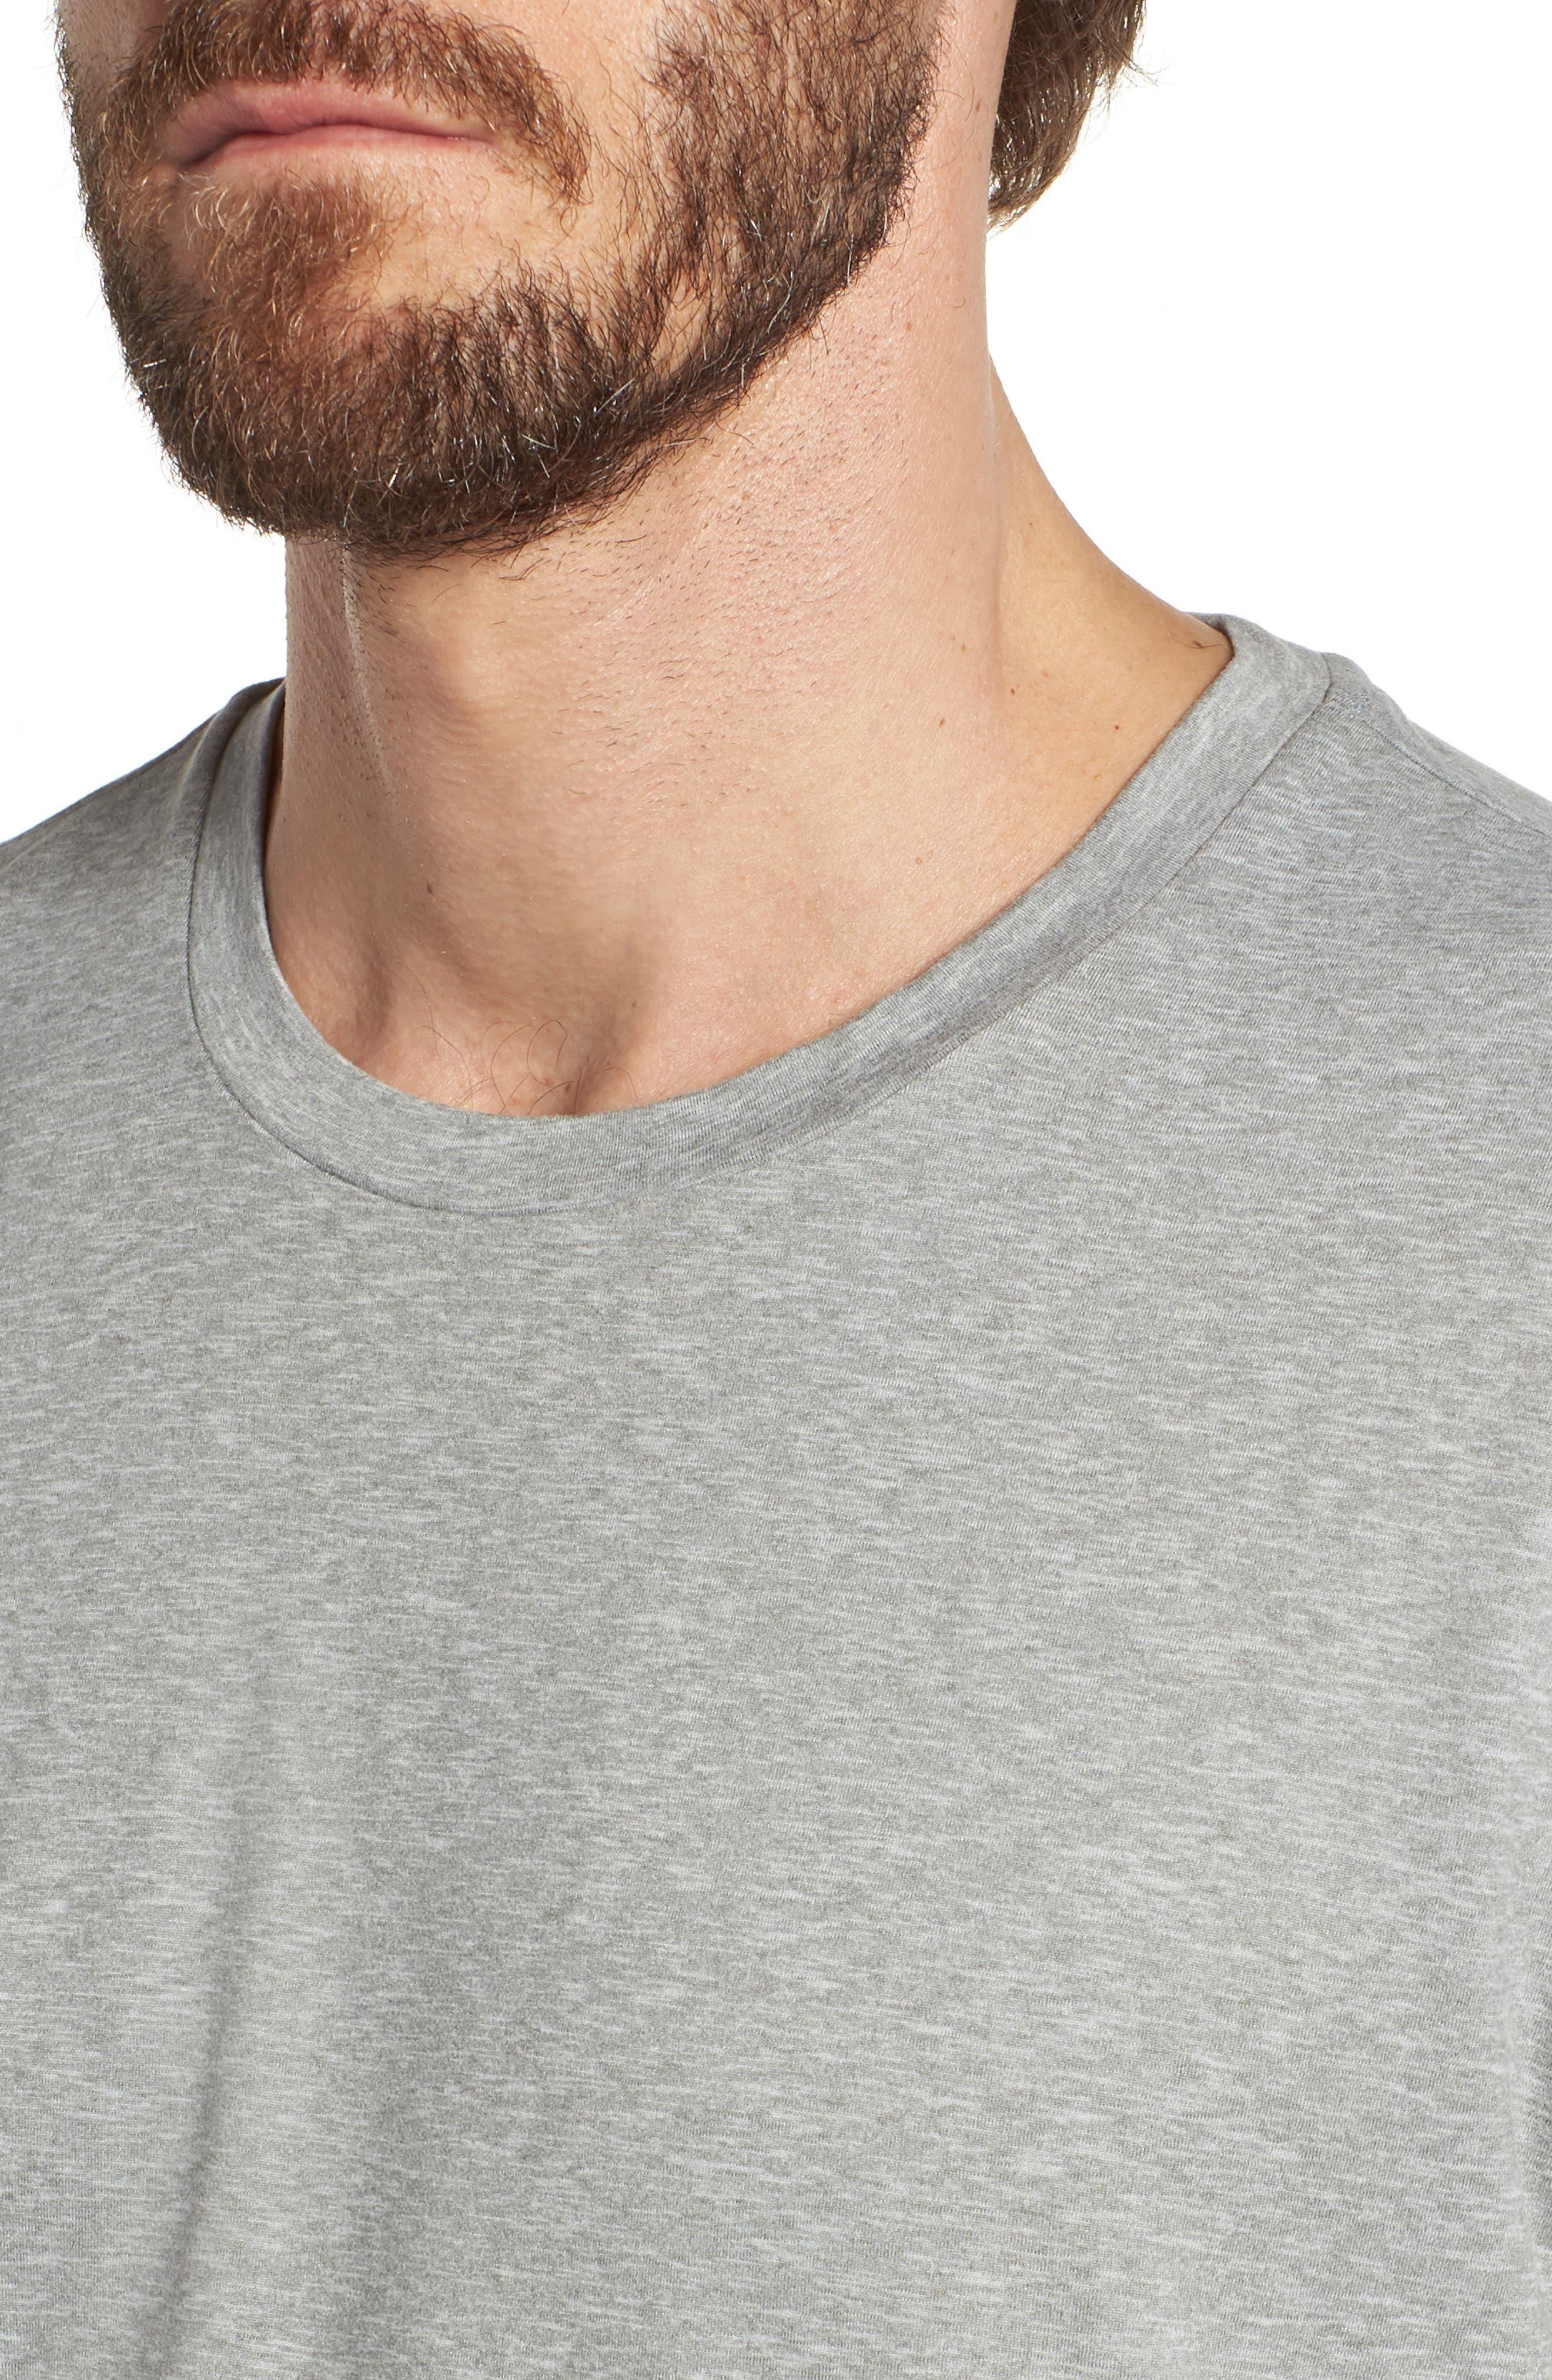 Therma Sleep Crewneck T-Shirt,                             Alternate thumbnail 4, color,                             033